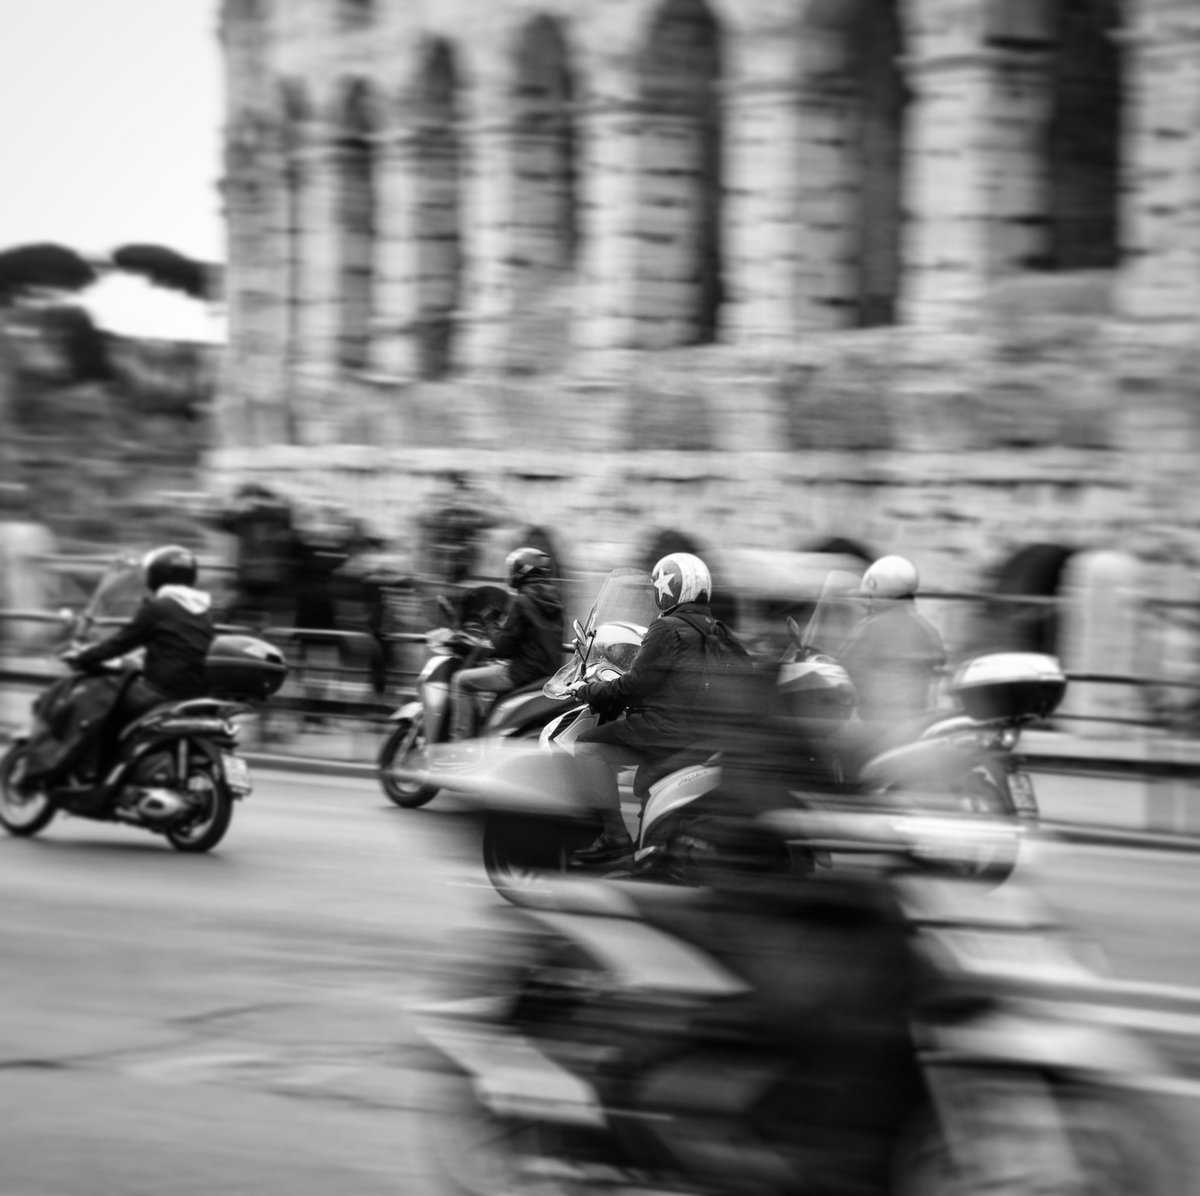 STARMAN . #streetsofrome #lifeinbw #Rome #colloseum #biancoeneroitalia  #blackandwhitephotography #streetphotography #wheninrome #marjamjars #streetshotpic.twitter.com/iLmiCCi3KO